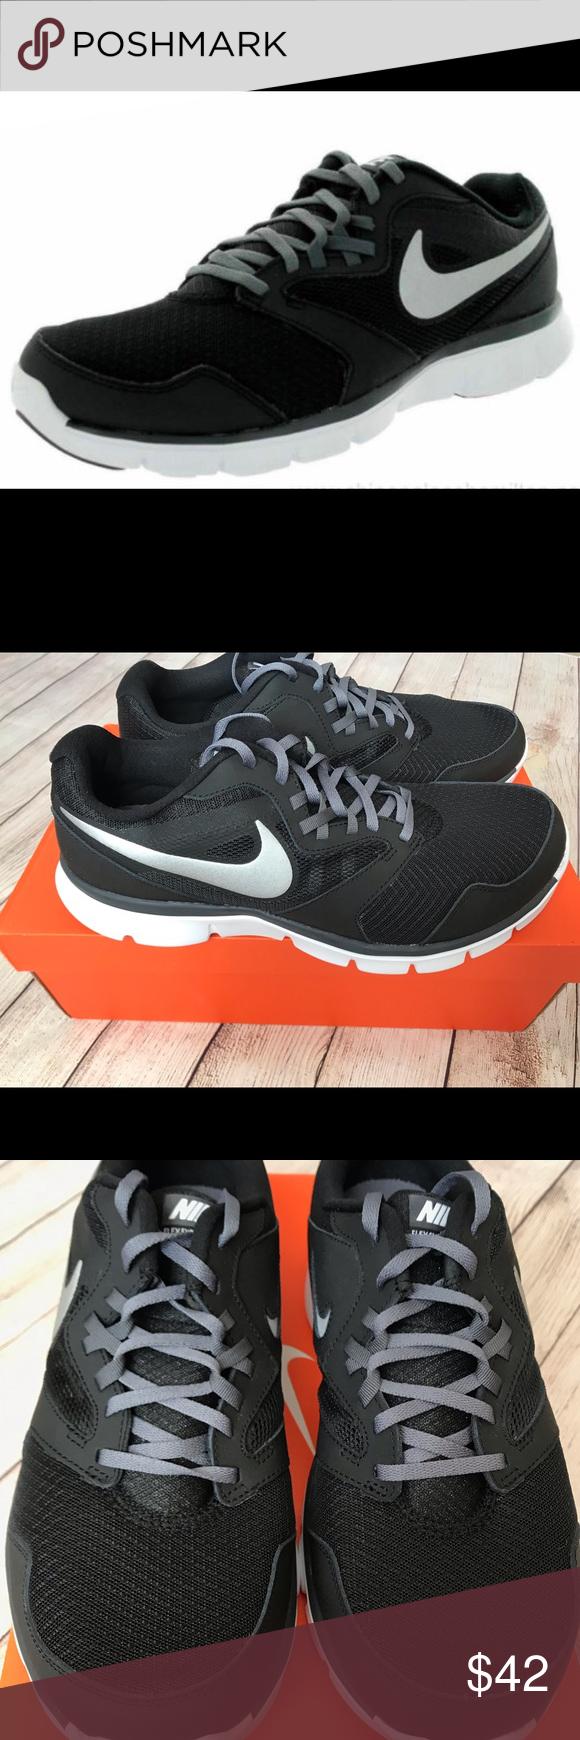 4E) Sz 11 Wide | Nike men, Nike